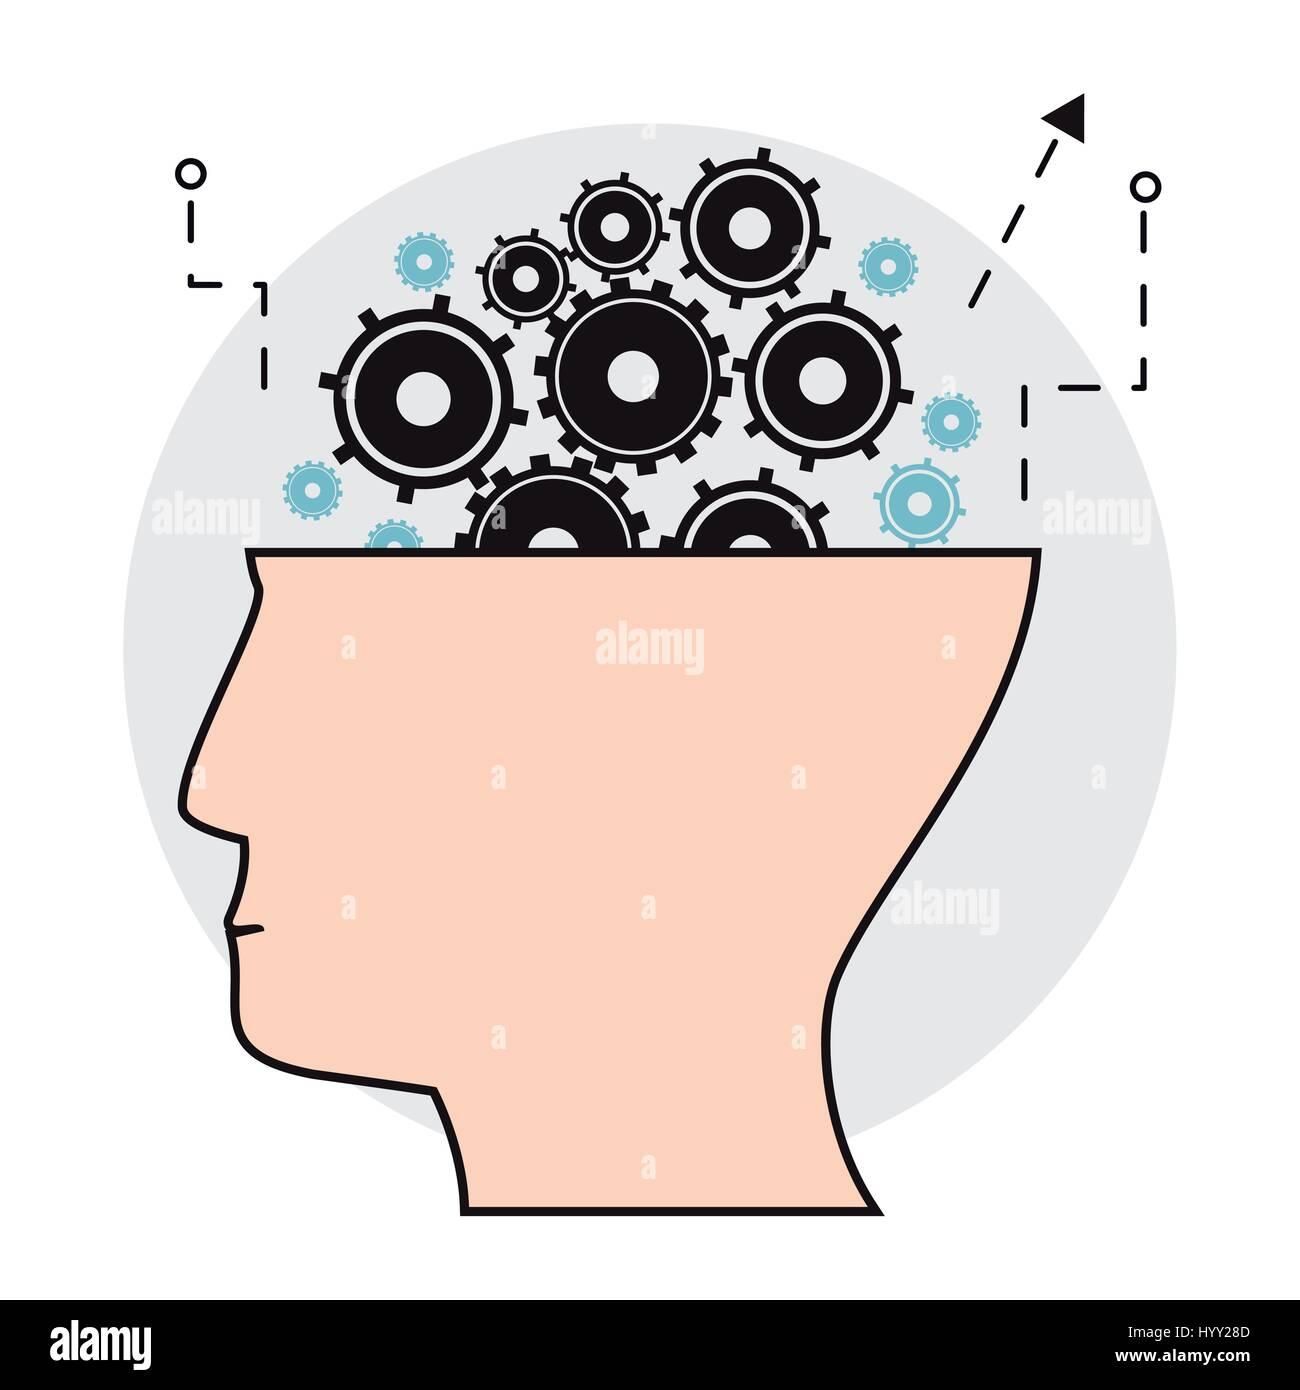 human head gears creativity image - Stock Image